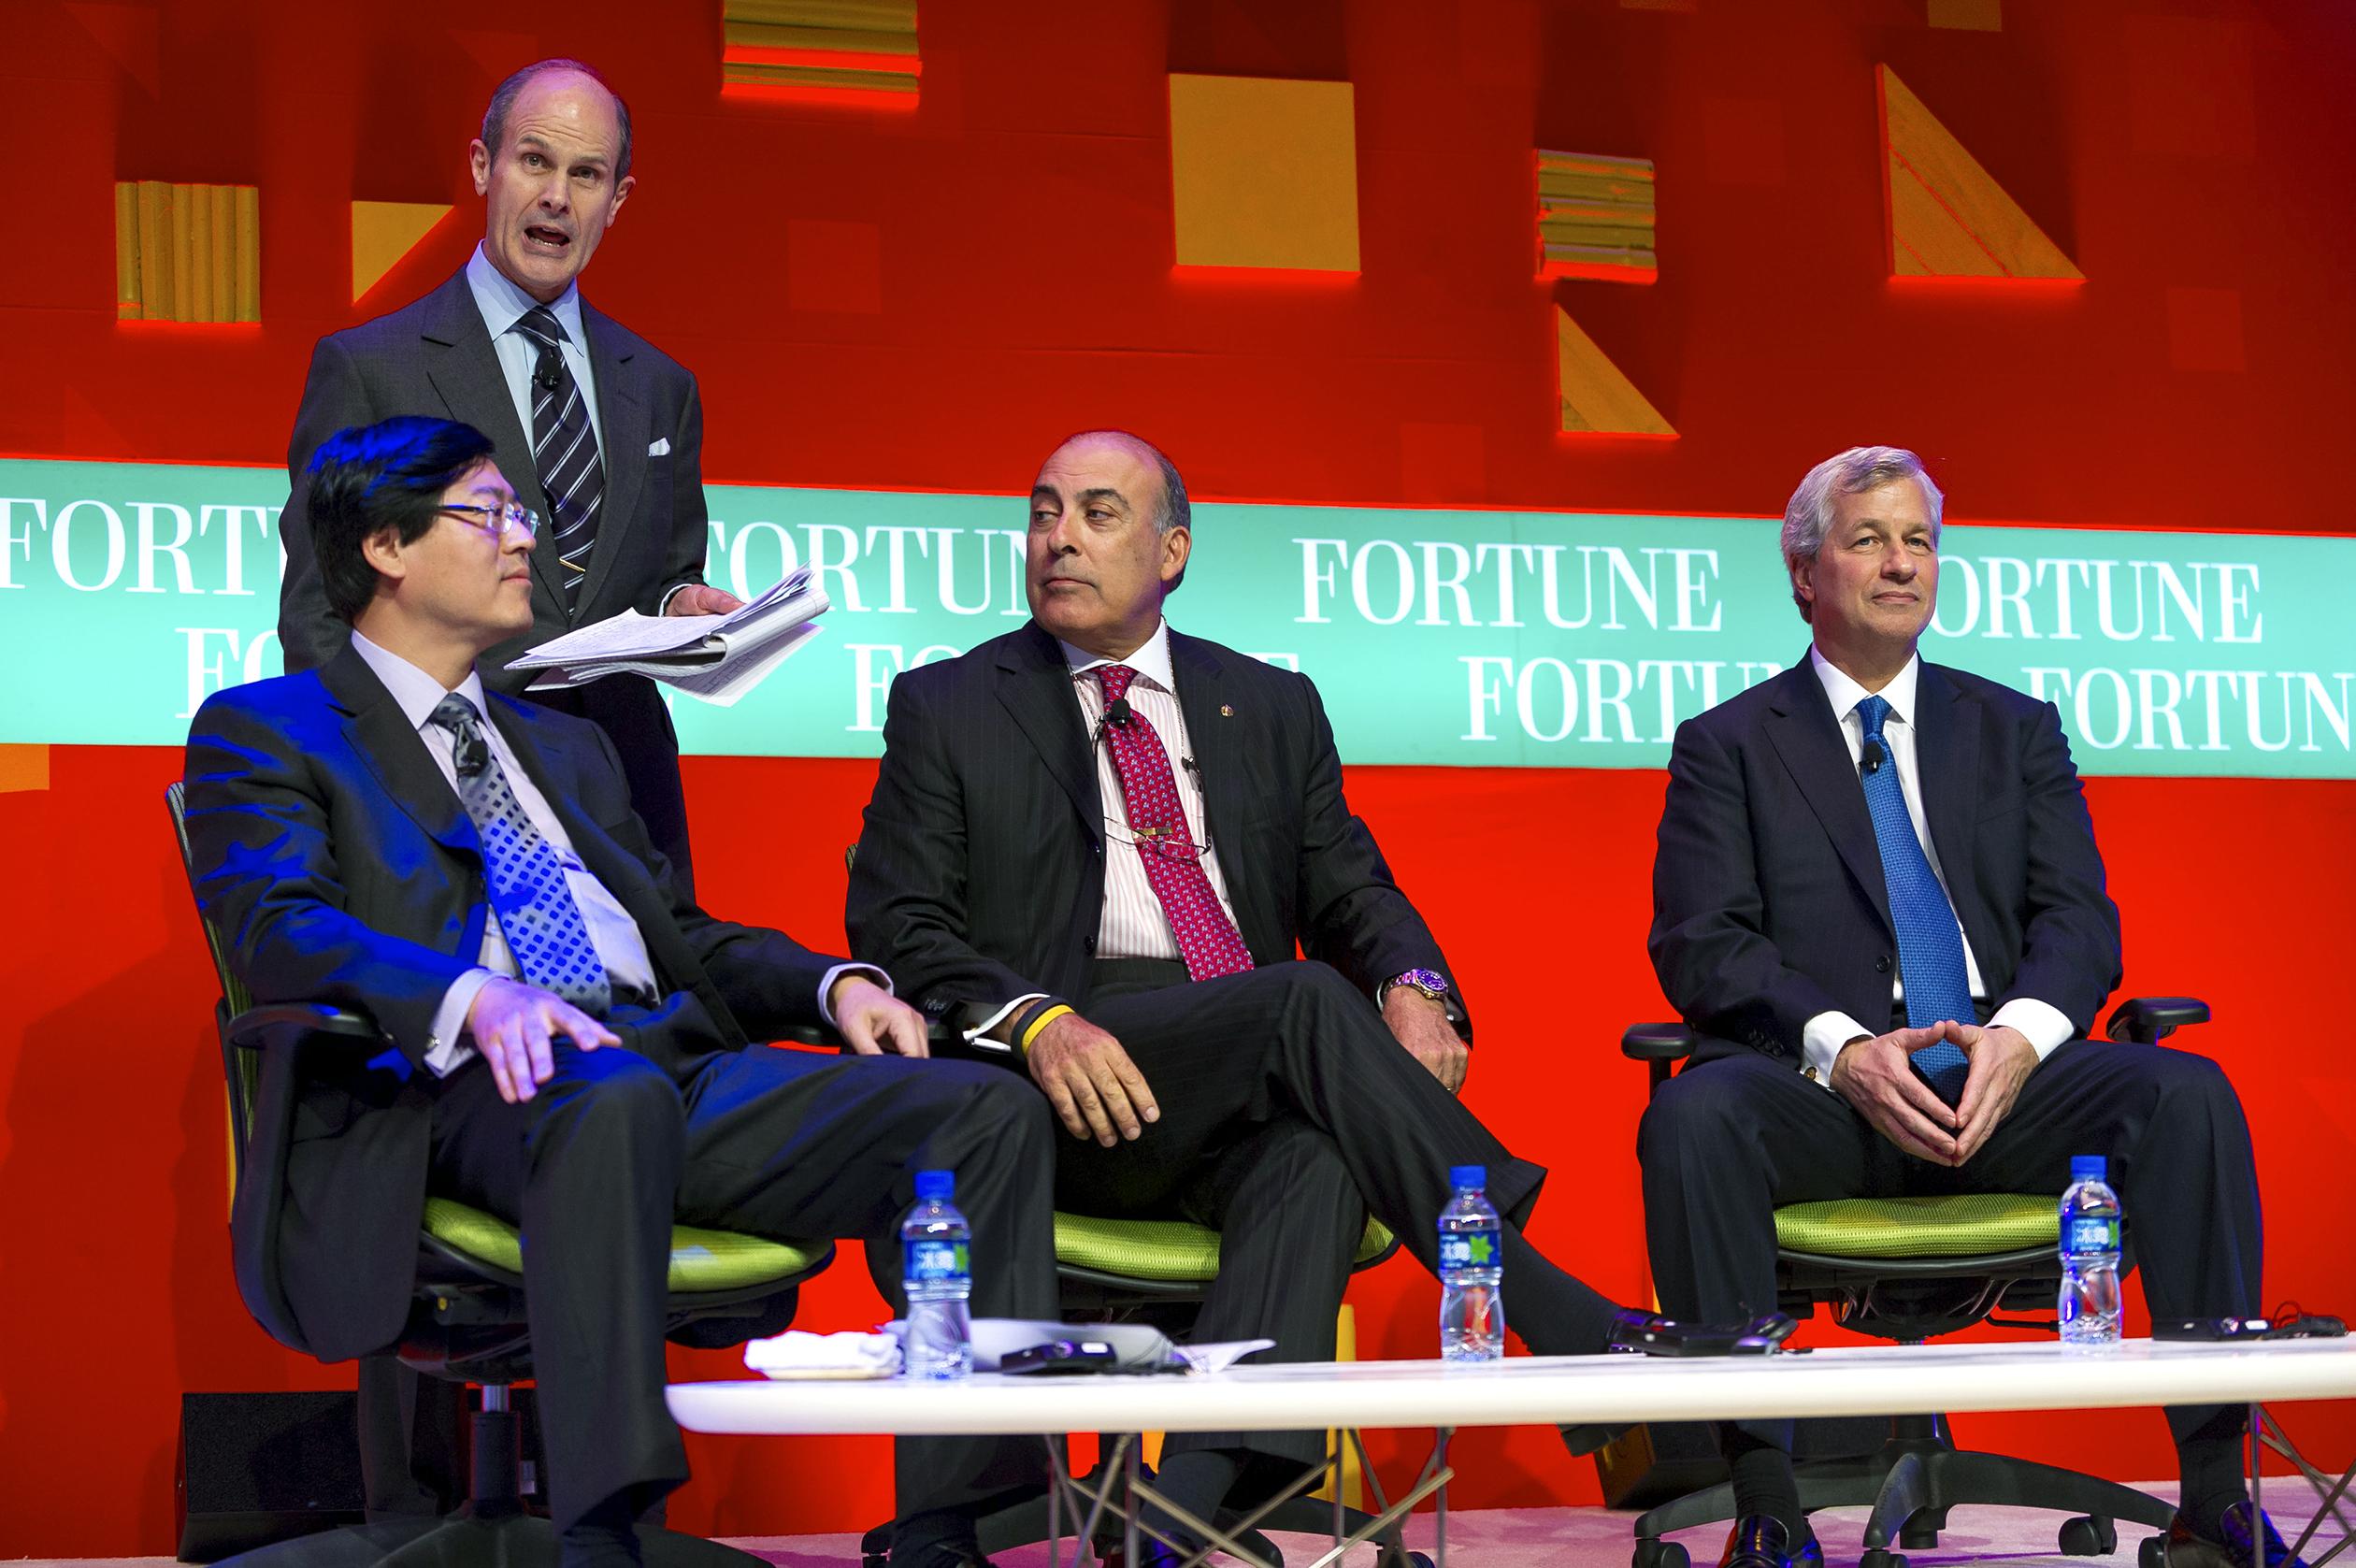 Fortune Global Forum 2013